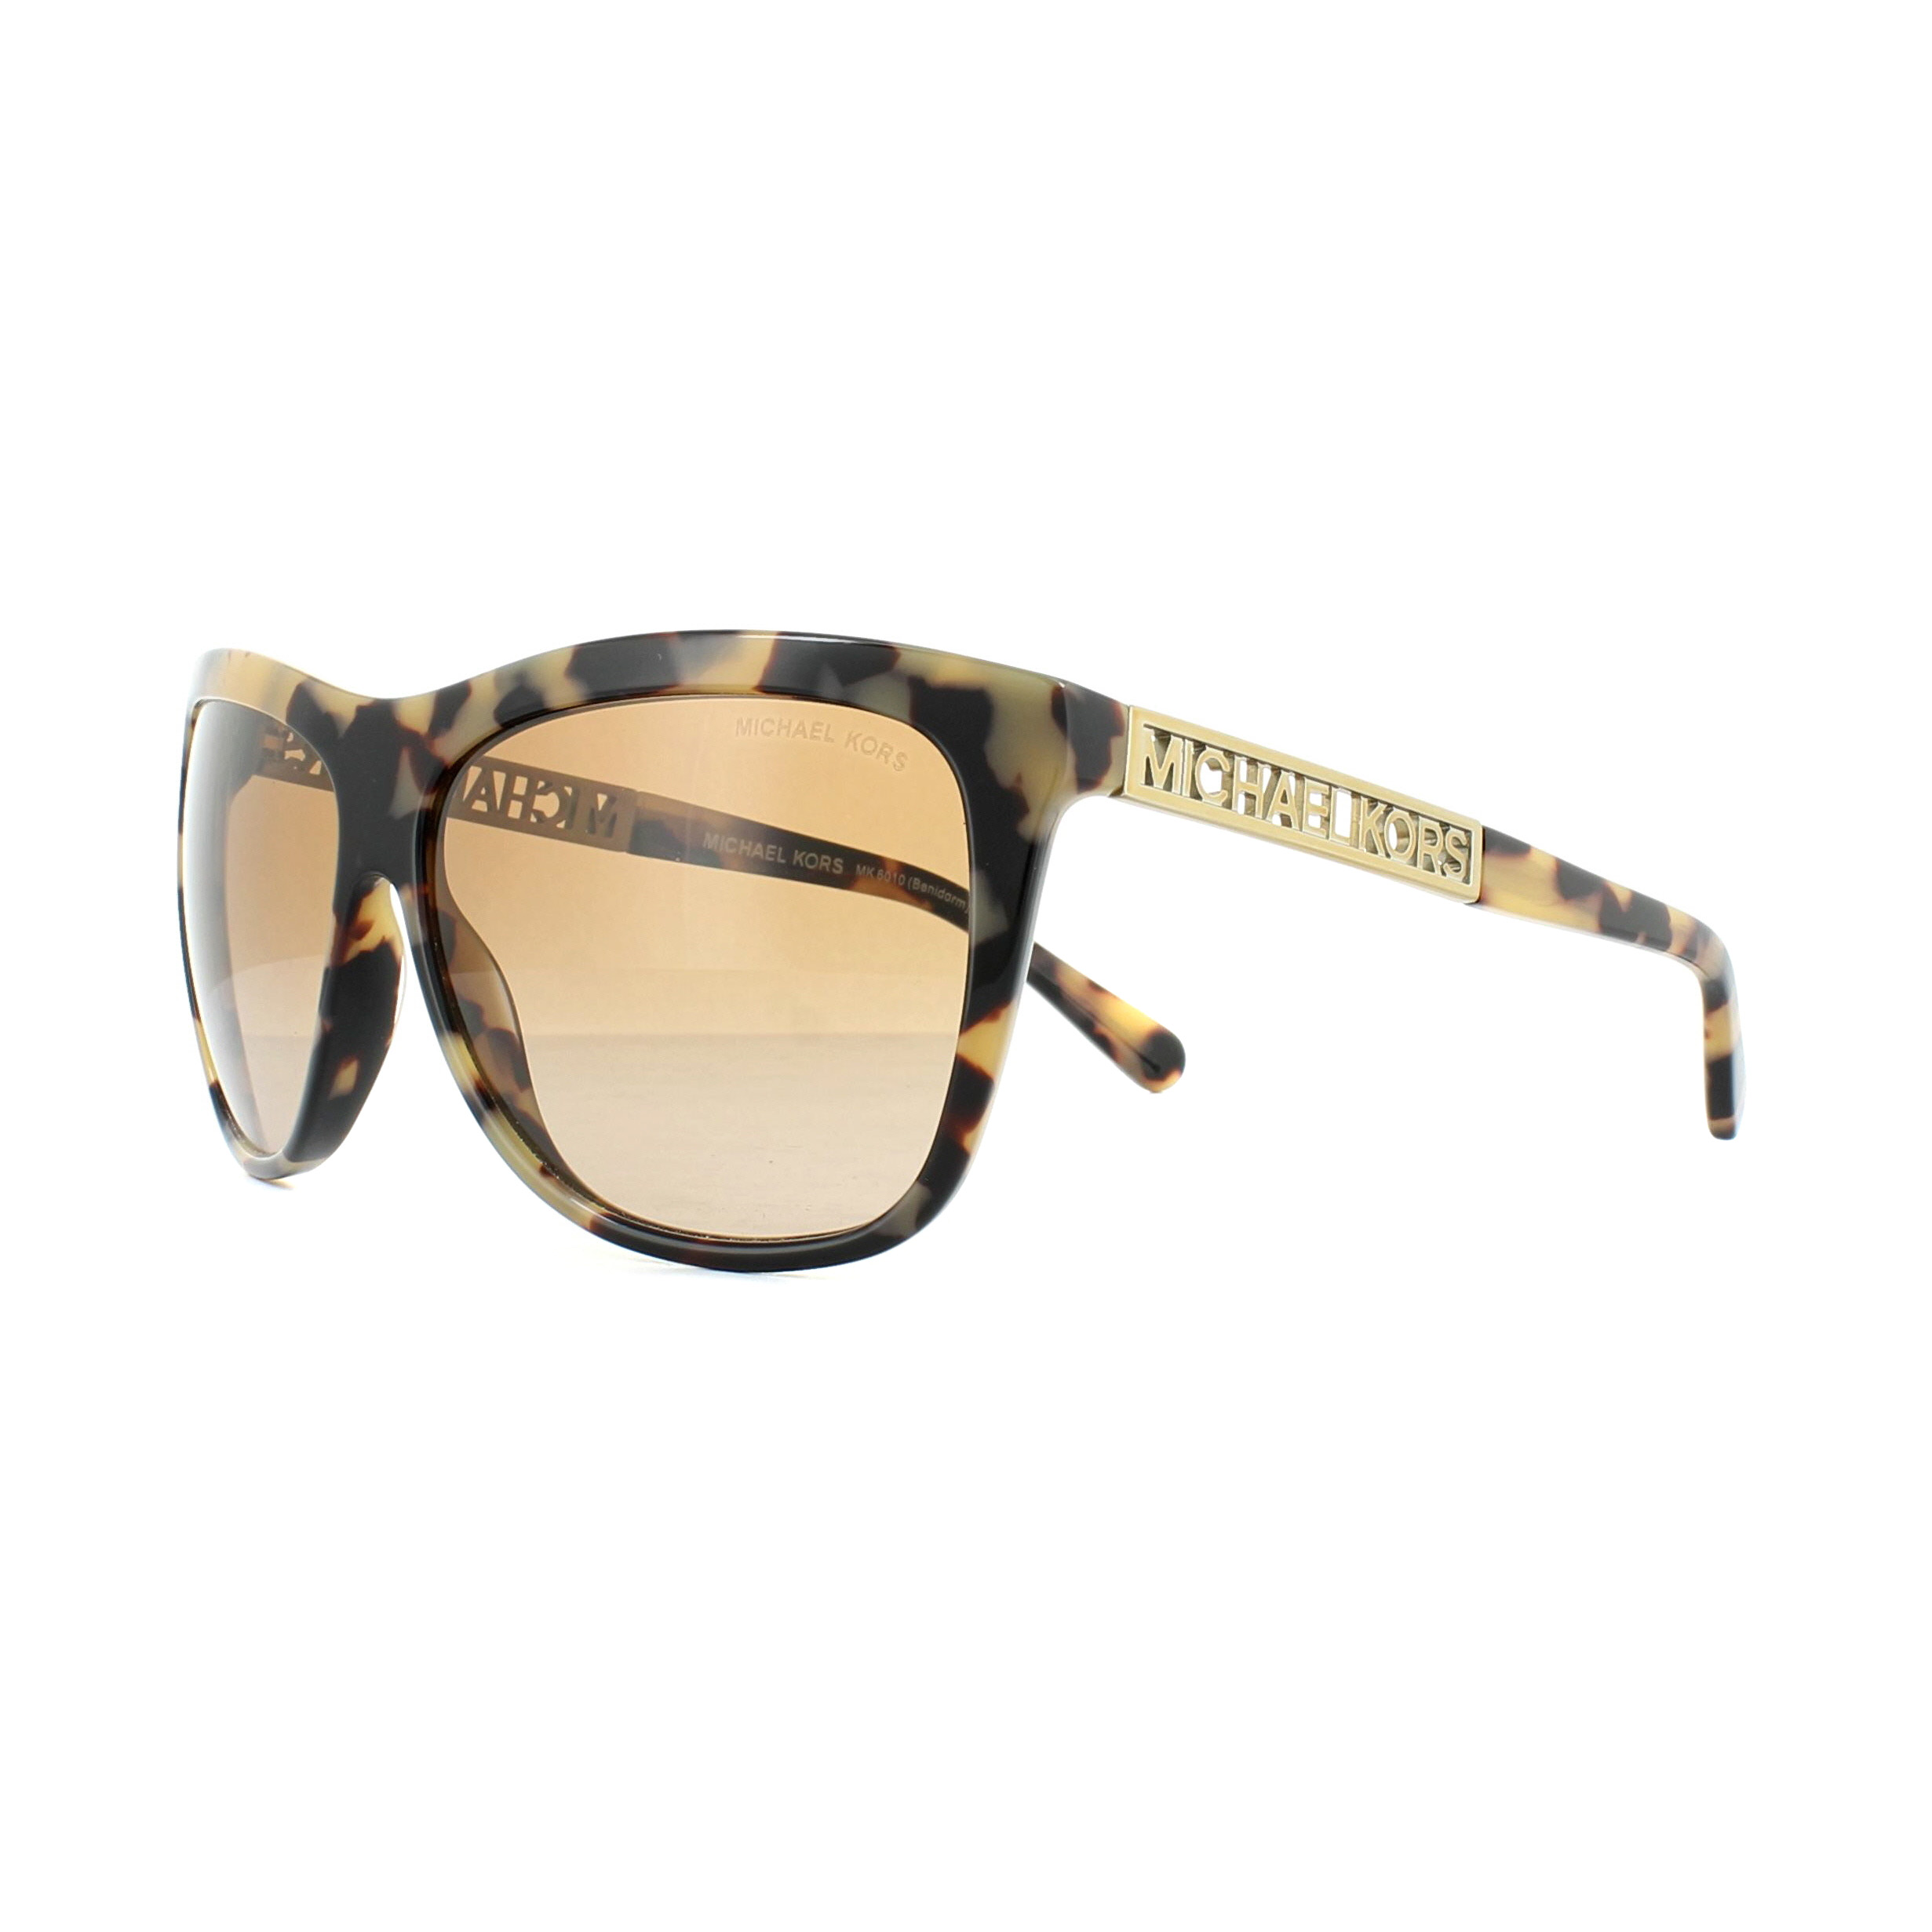 a3fa1be590 Sentinel Michael Kors Sunglasses Benidorm 6010 301313 Vintage Tortoise  Brown Gradient